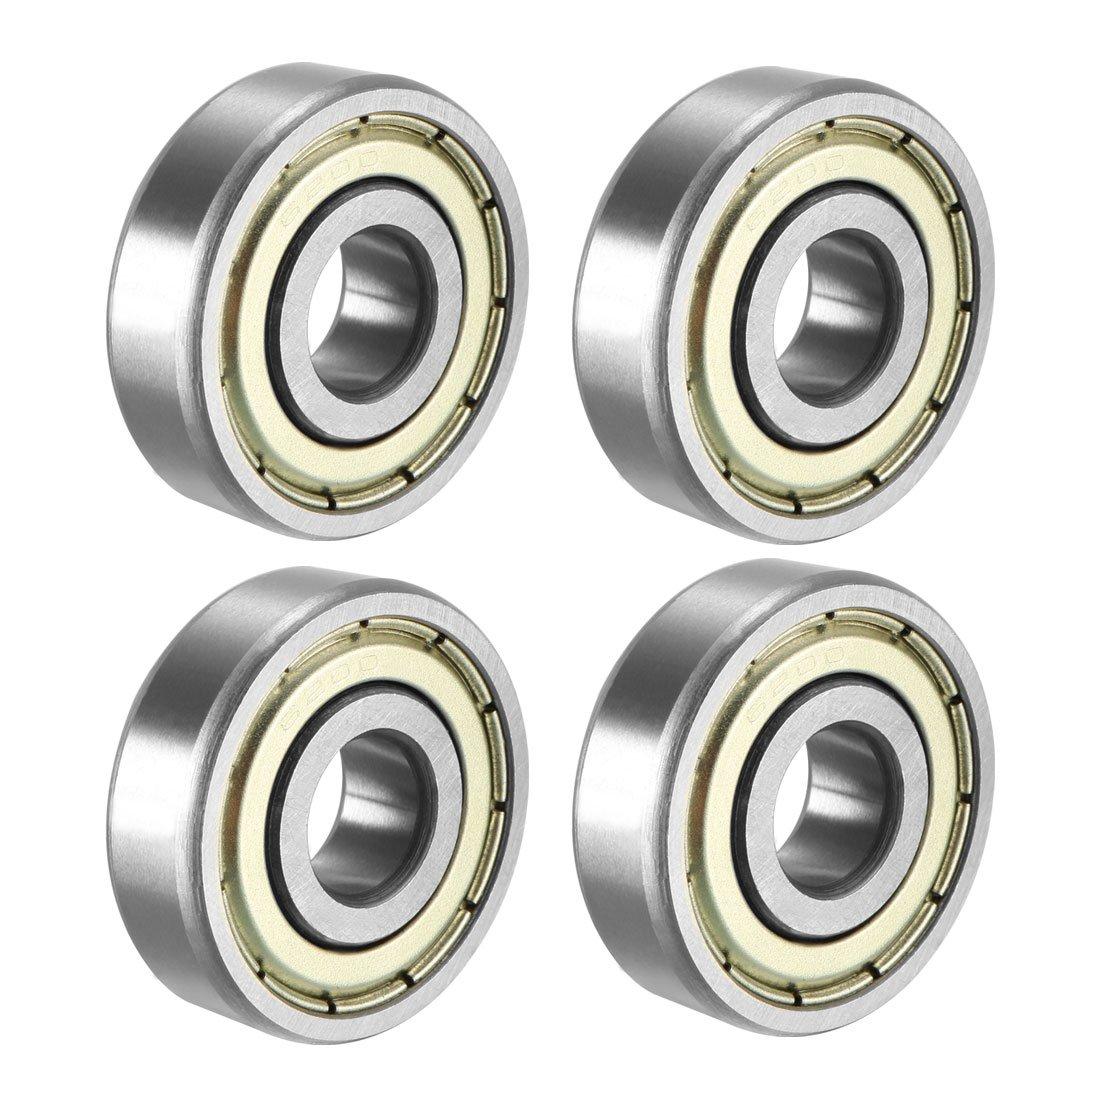 FGen 100pcs Low Noise Motor Dedicated 608RS Skateboard Bearing Fingertip Gyro Special Bearing Radial Ball Bearings